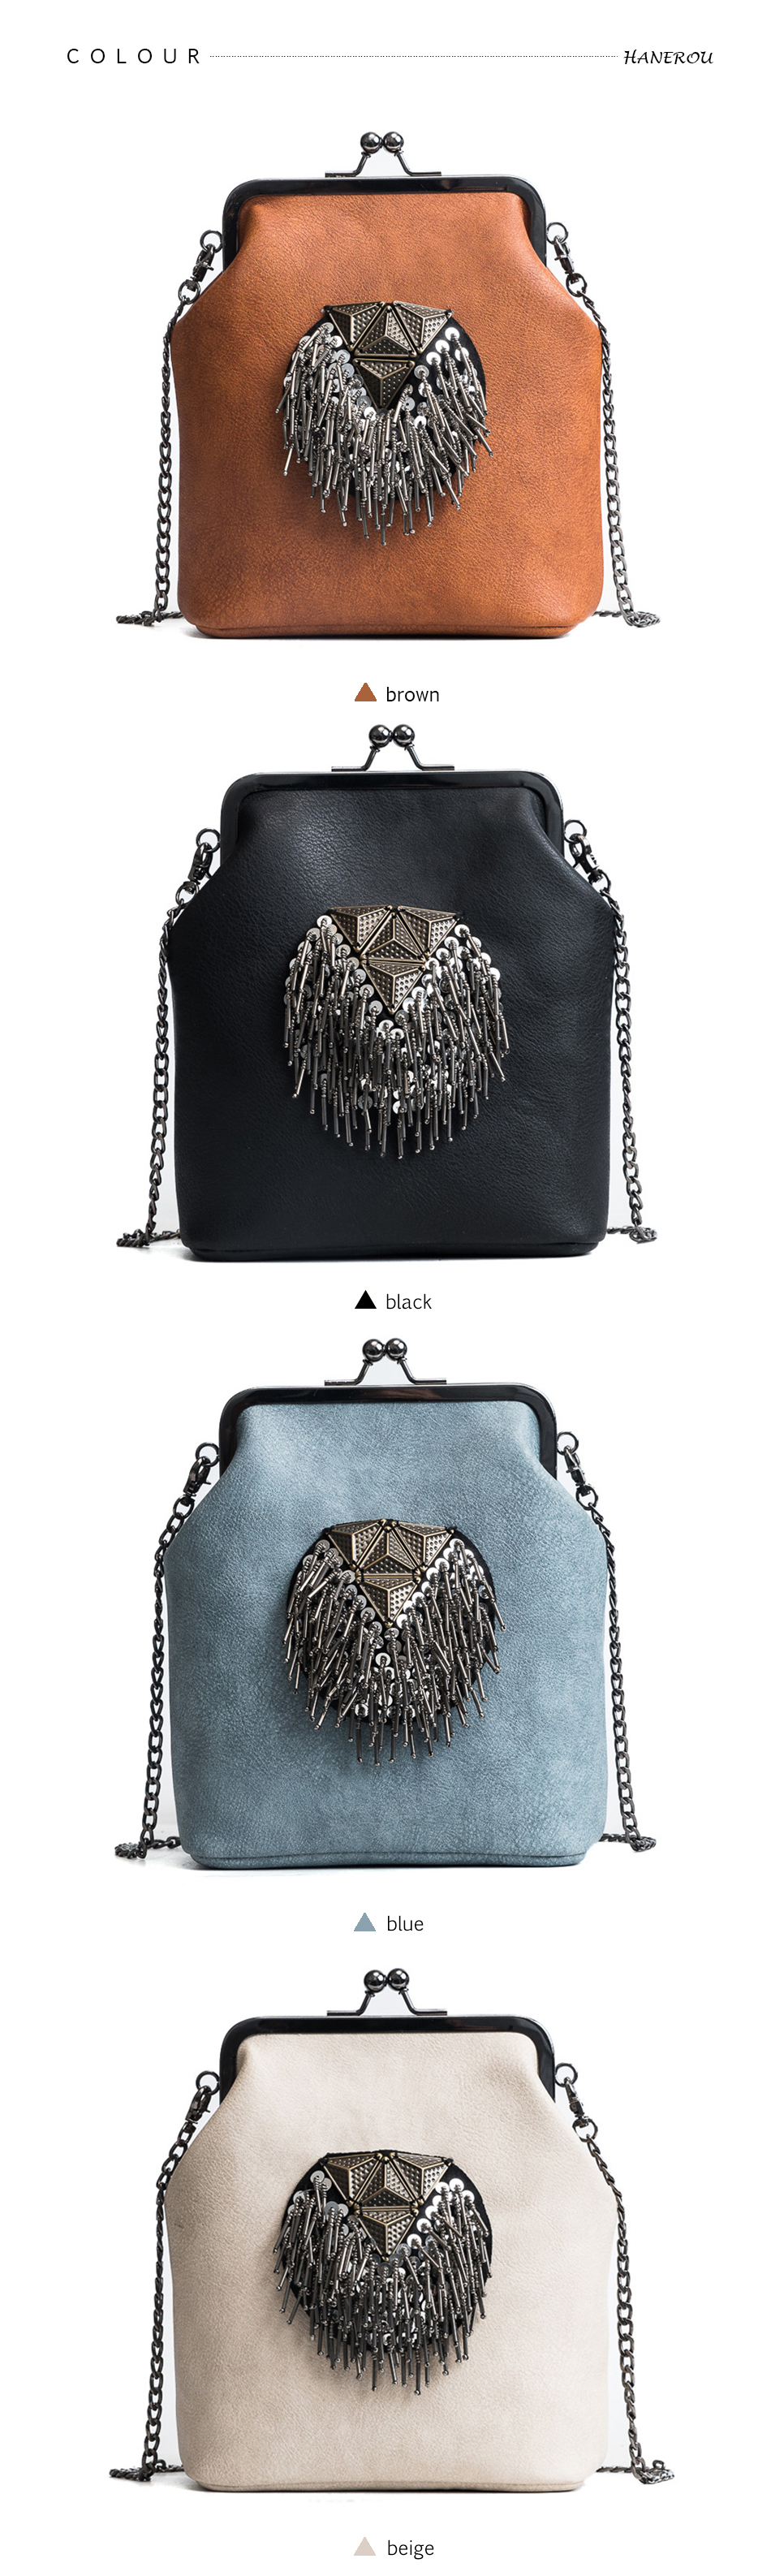 HANEROU Messenger Bags for Women PU Leather Tassel Fashion Frame Bag ... 378c937f042bf